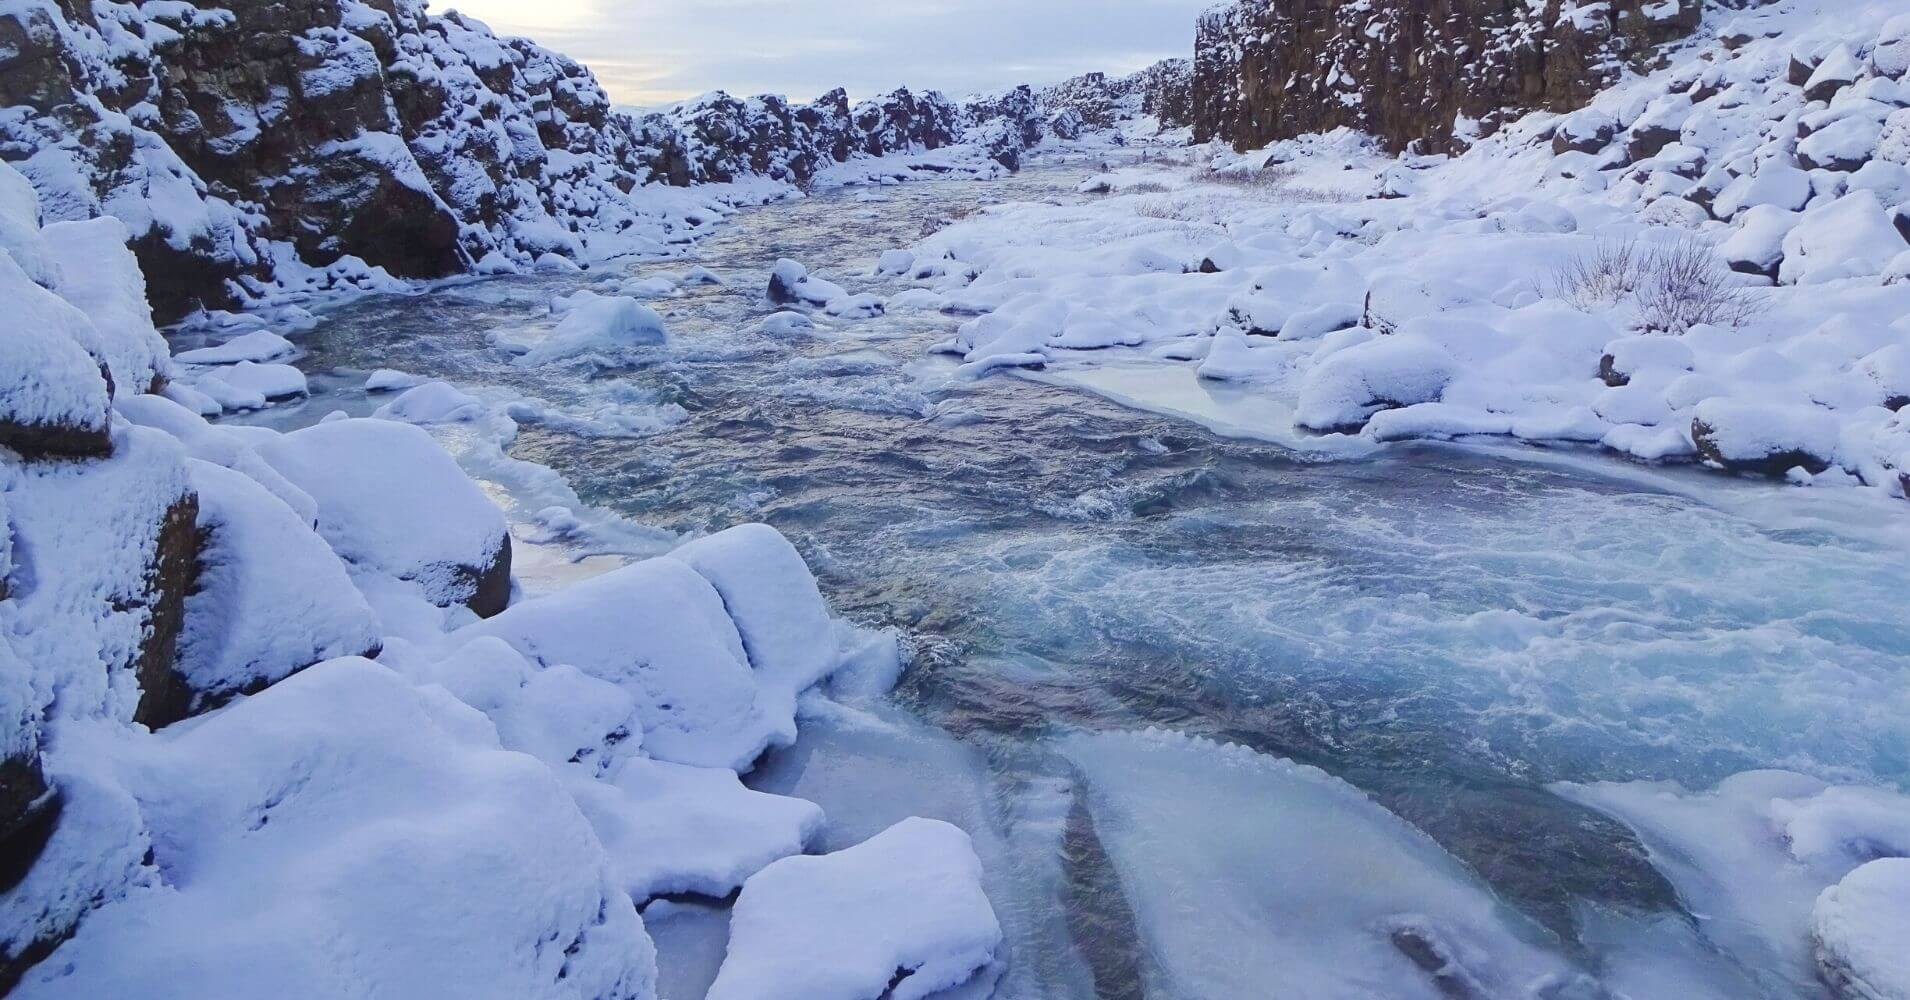 Río Hvitá en la Cascada de Gullfoss. Islandia.